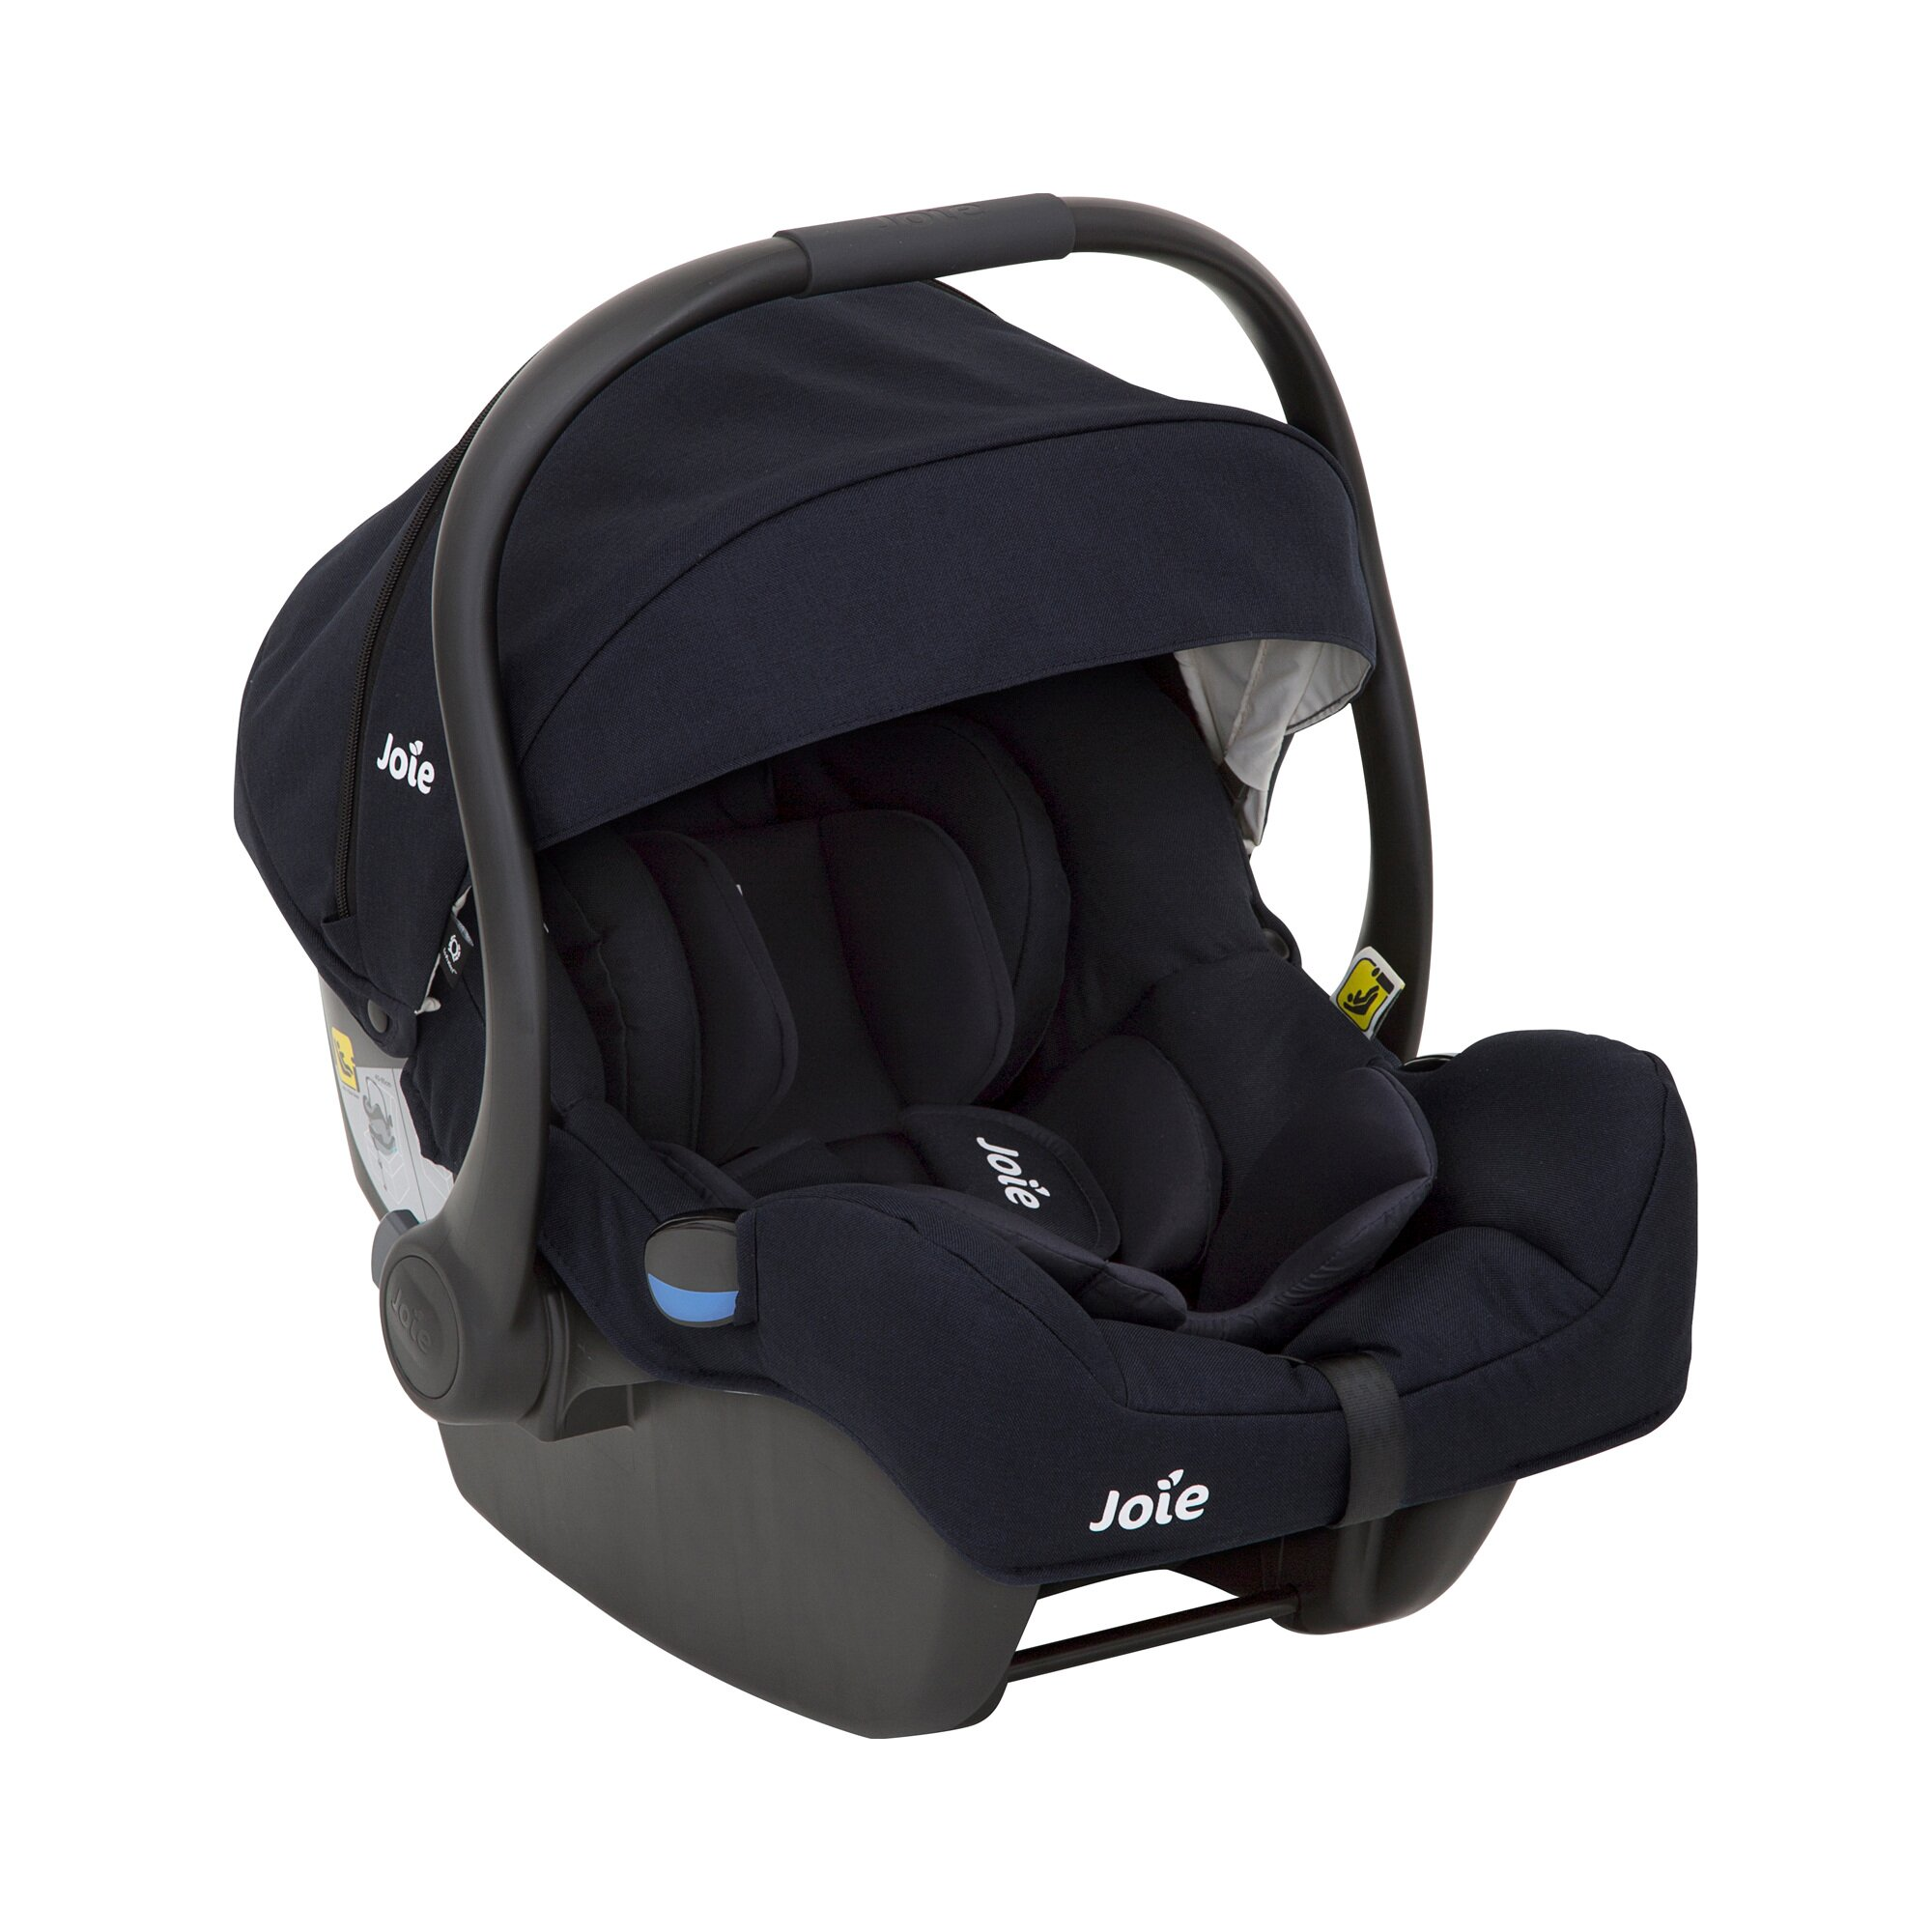 joie-i-gemm-i-size-babyschale-40cm-85cm-max-13kg-design-2018-blau